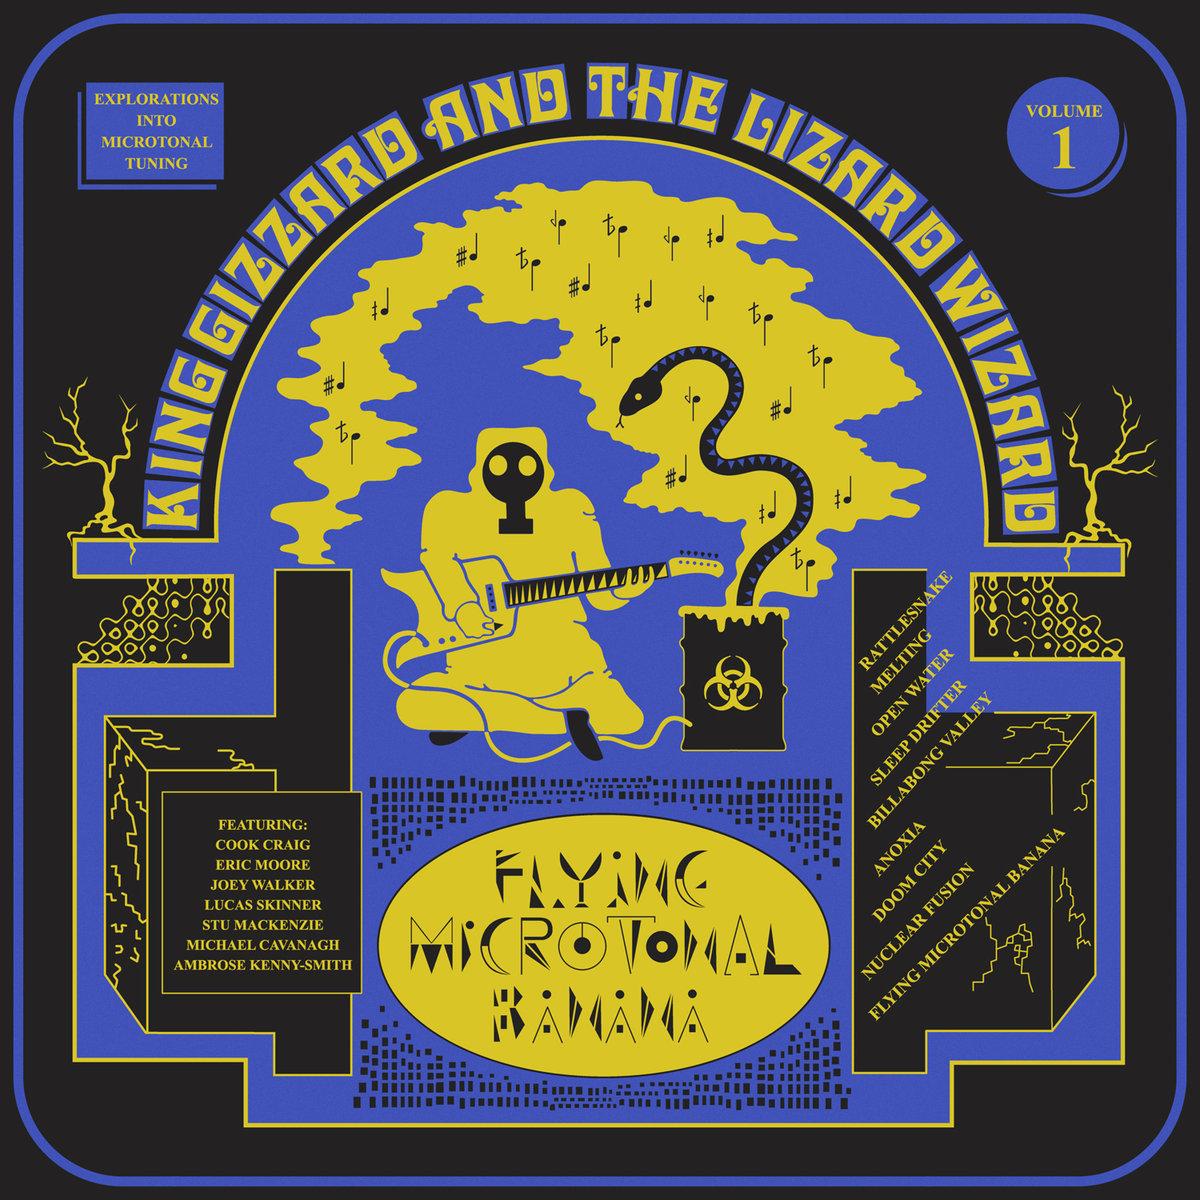 King Gizzard & The Lizard Wizard: Flying MicrotonalBanana